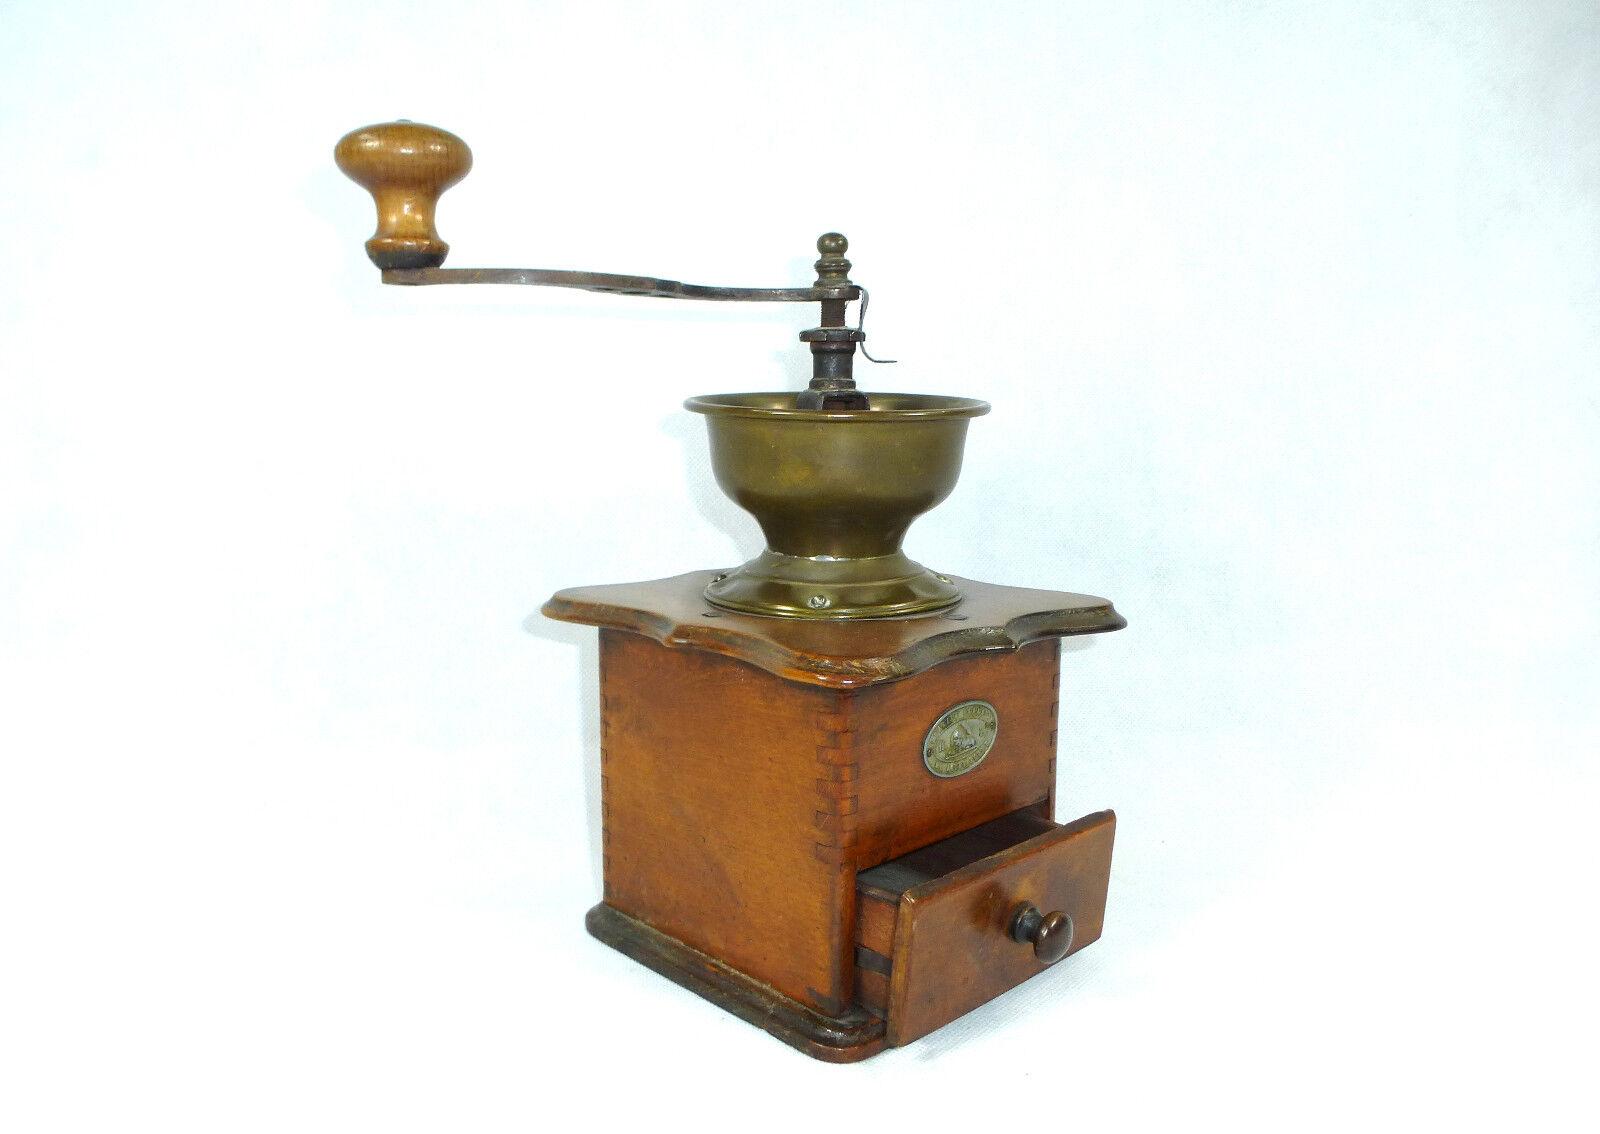 Unusual Coffee Mill tischmühle um 1860 FRANCE Belgium en acier forge